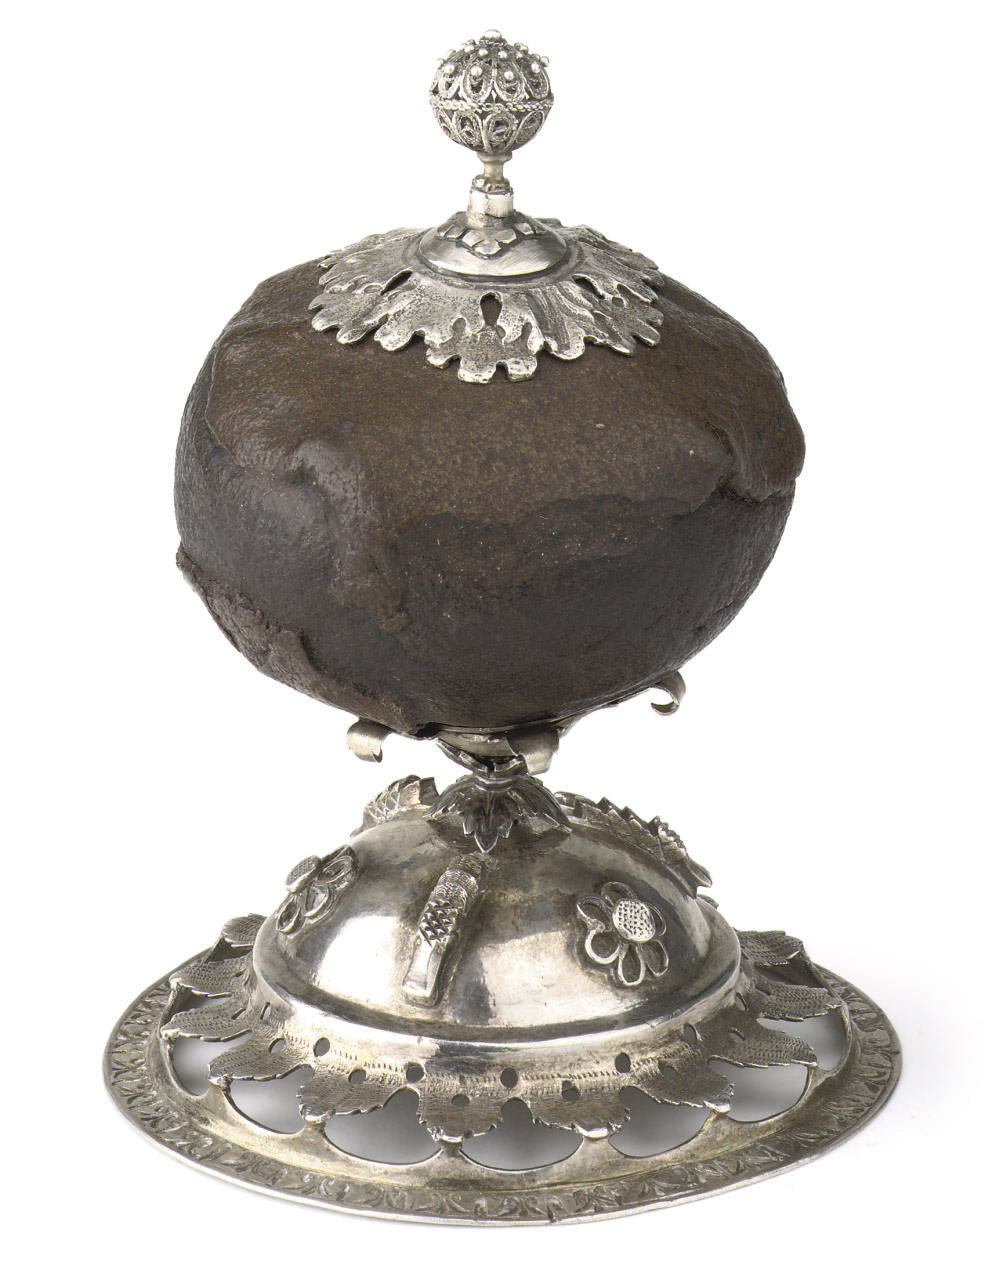 A silver-mounted bezoar stone